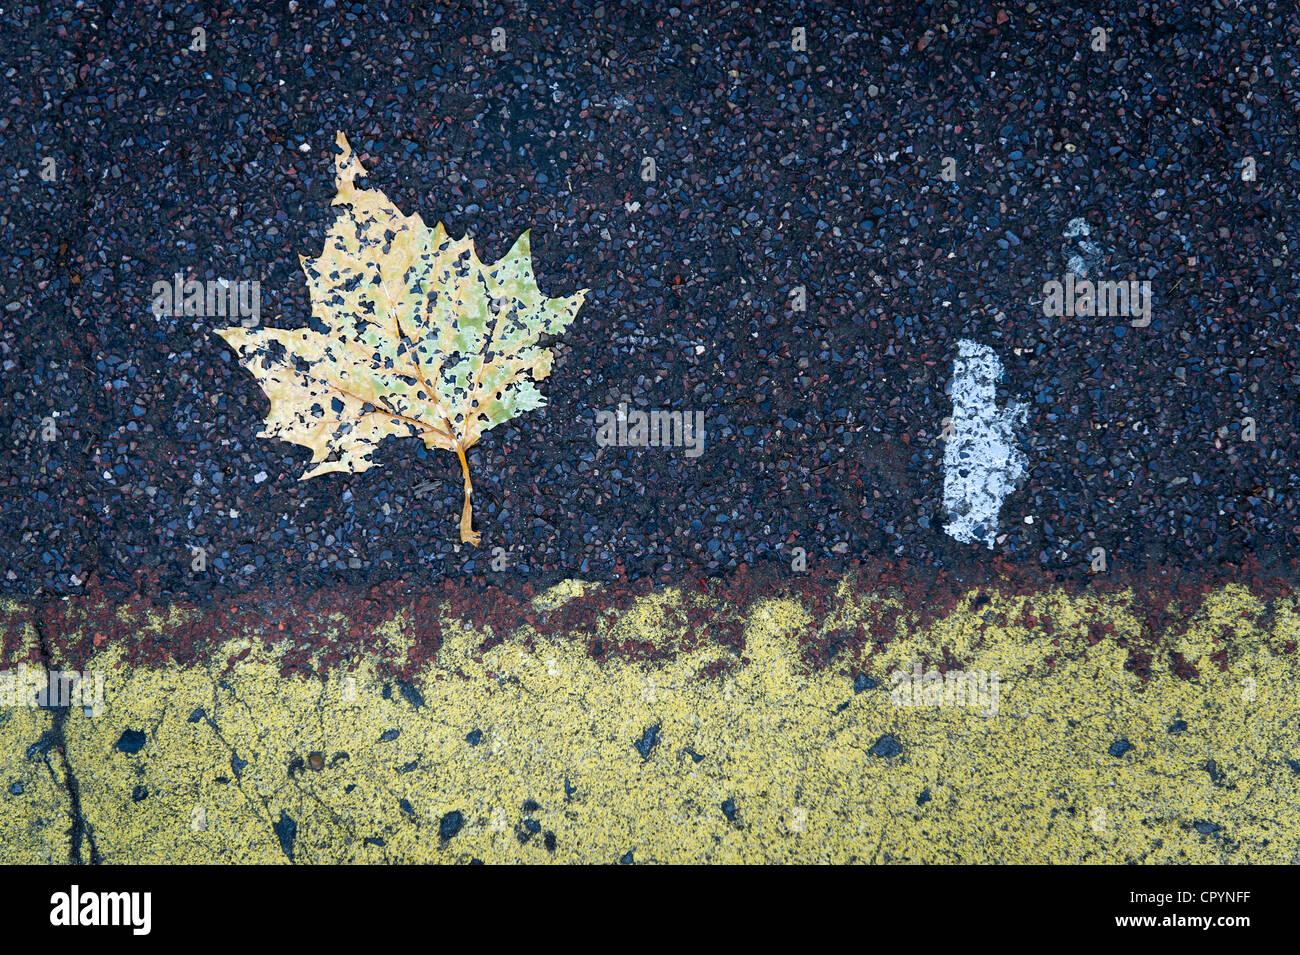 La feuille et le marquage routier, Brixton, Londres, Angleterre, Royaume-Uni, Europe Photo Stock